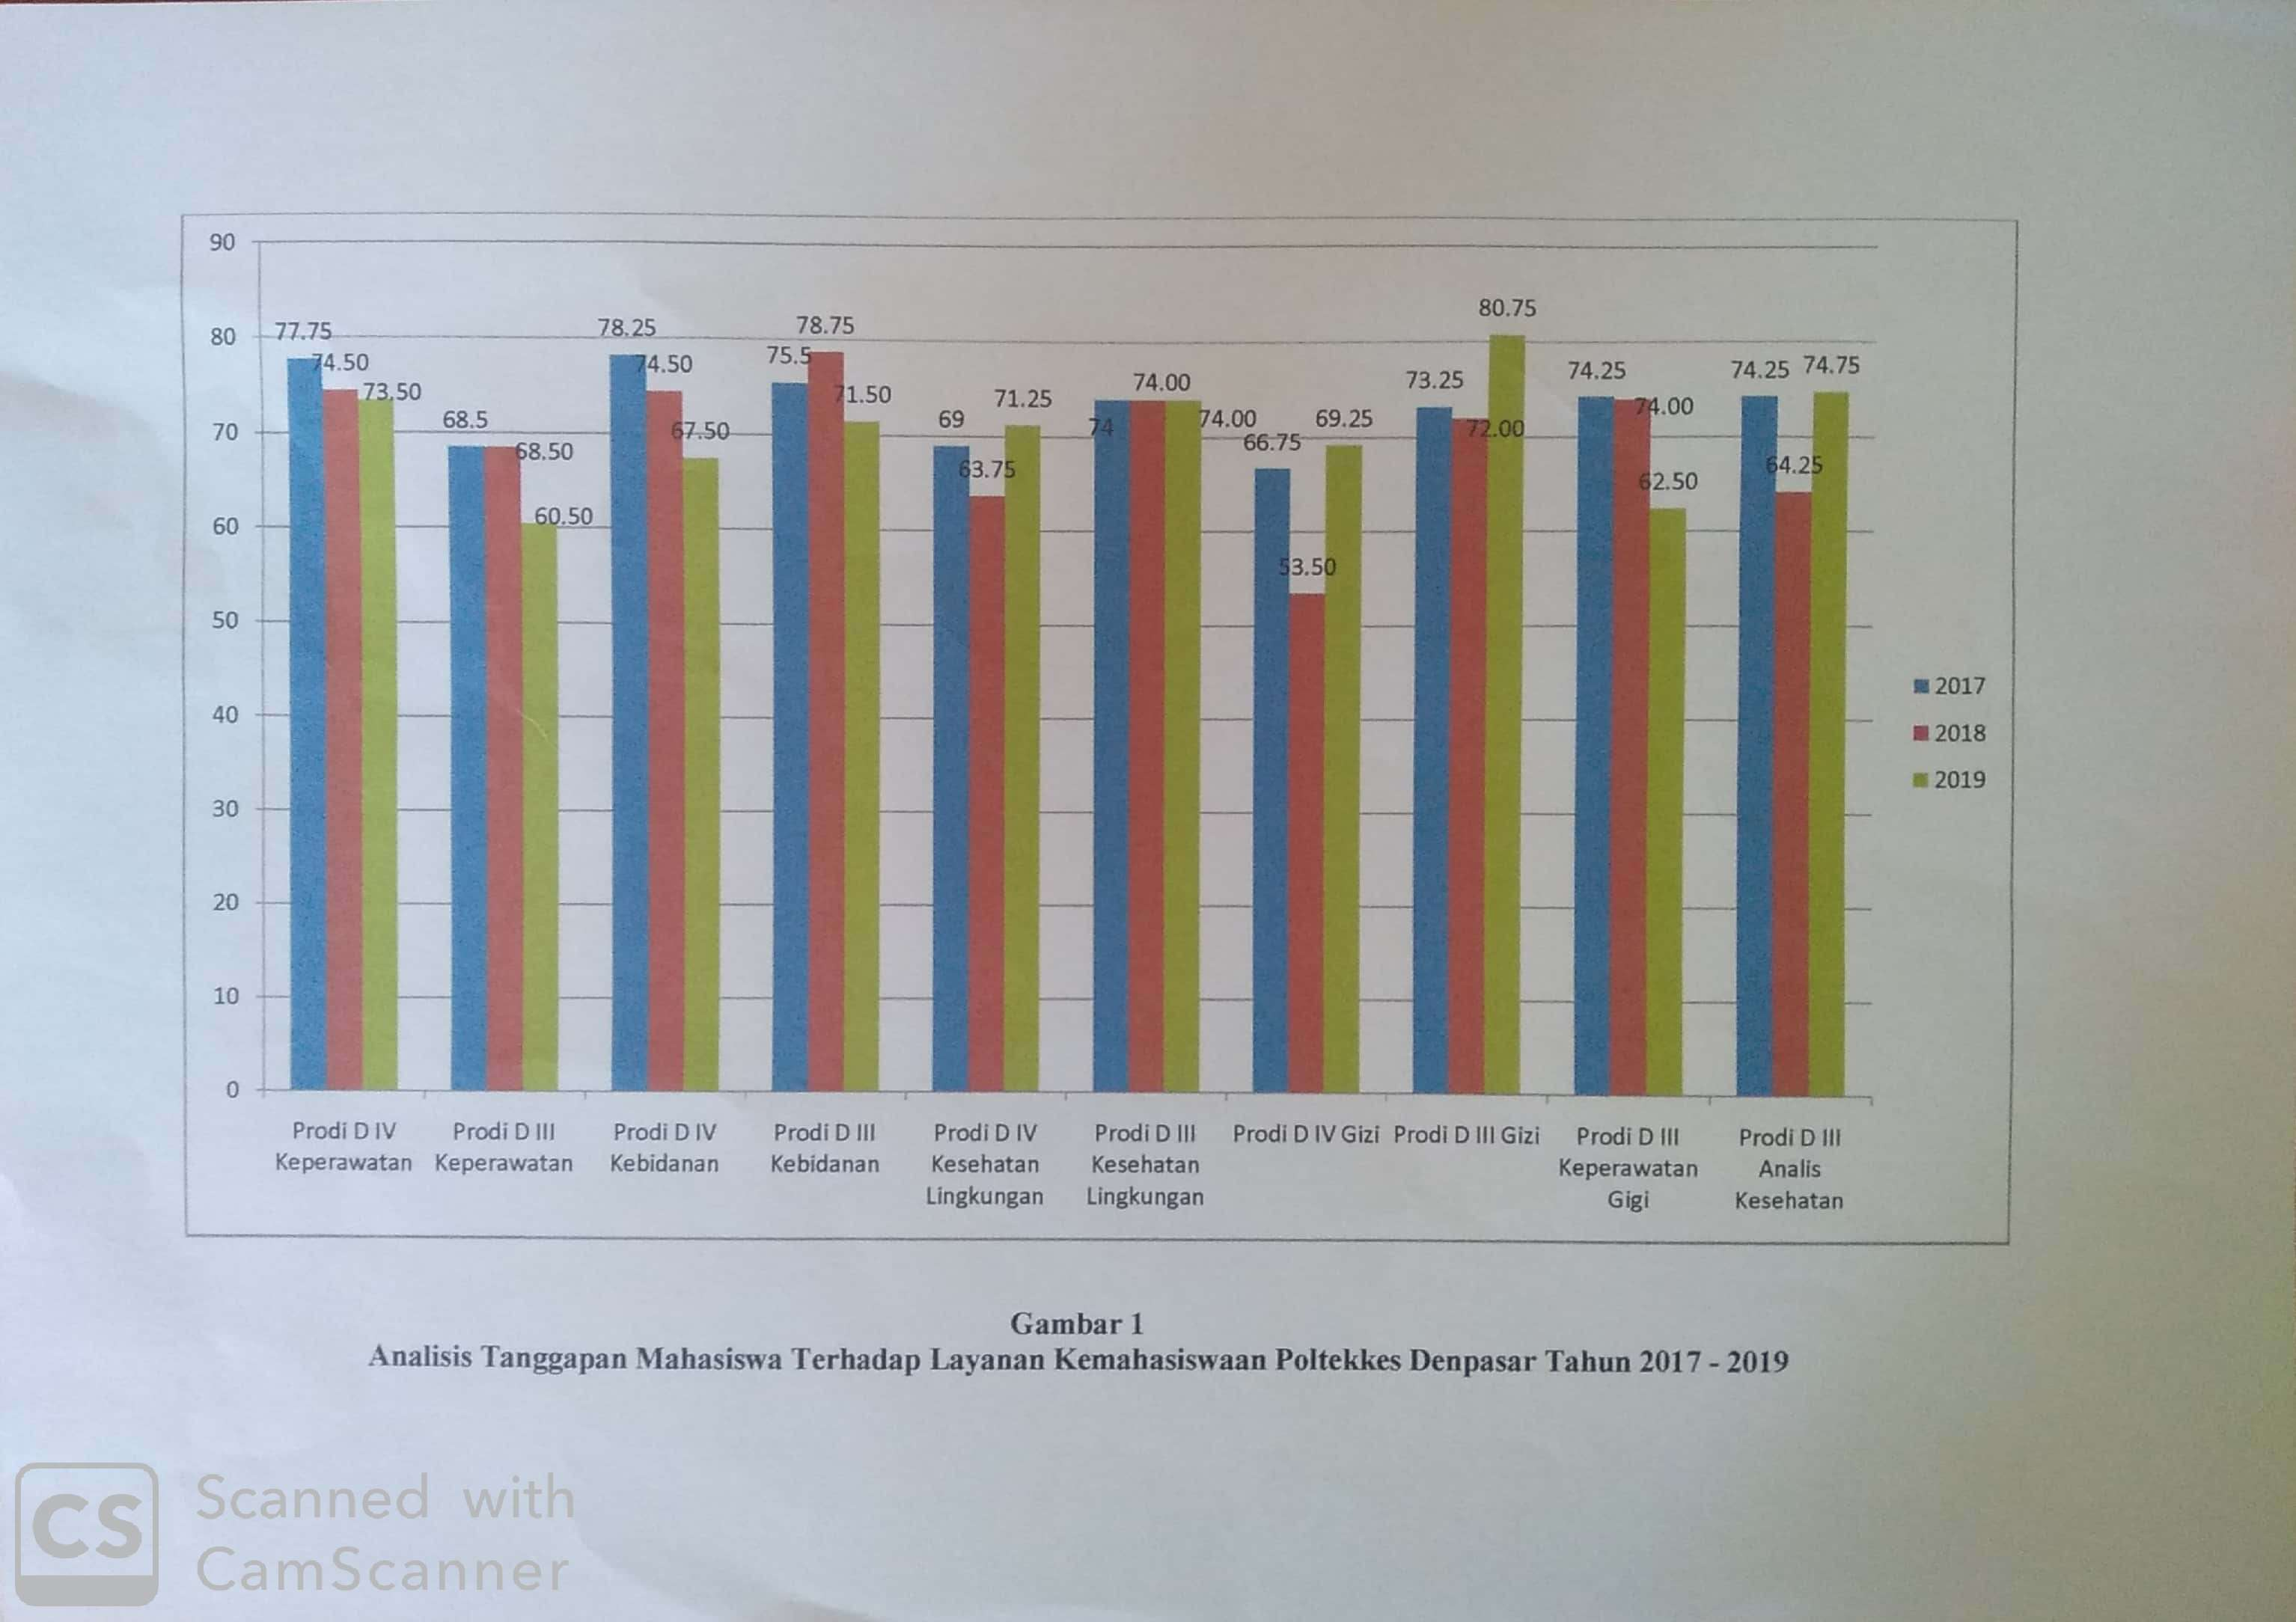 analisis tanggapan mahasiswa